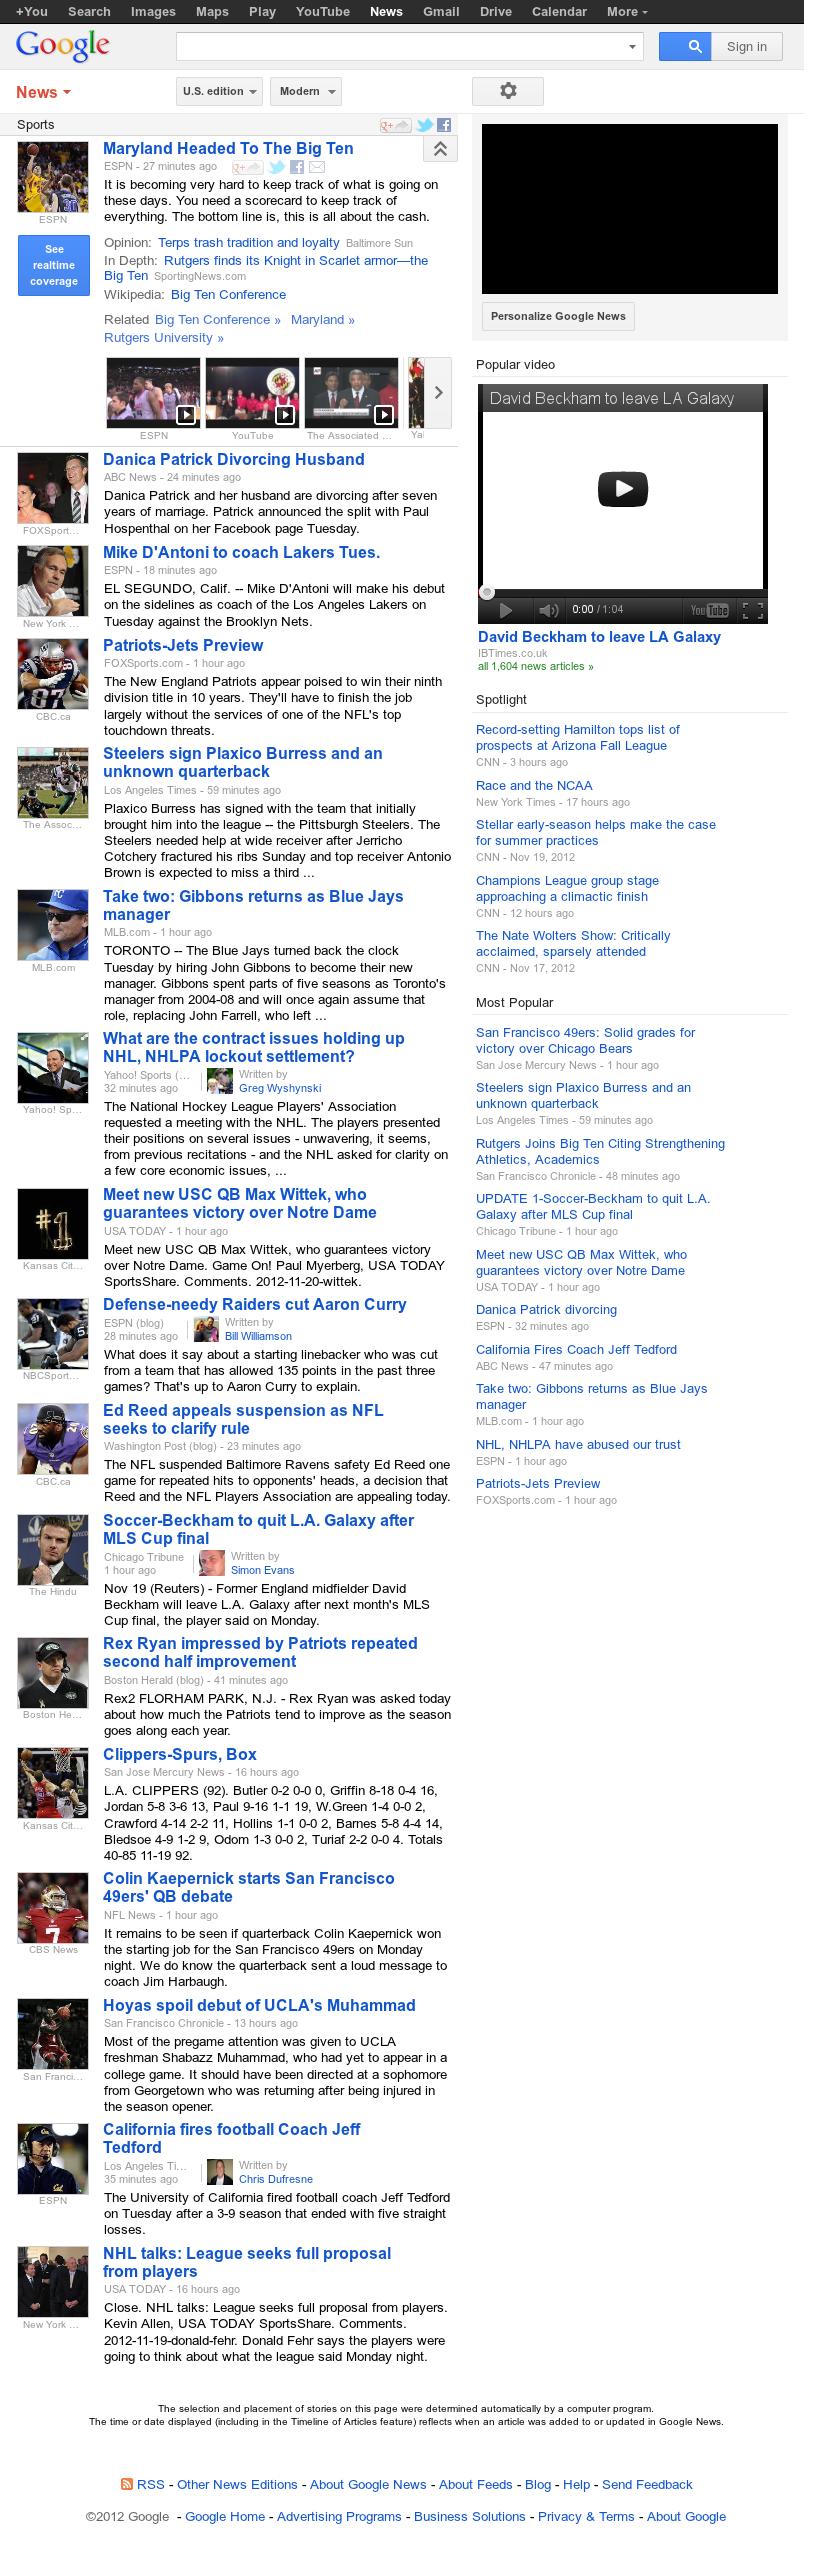 Google News: Sports at Tuesday Nov. 20, 2012, 9:12 p.m. UTC